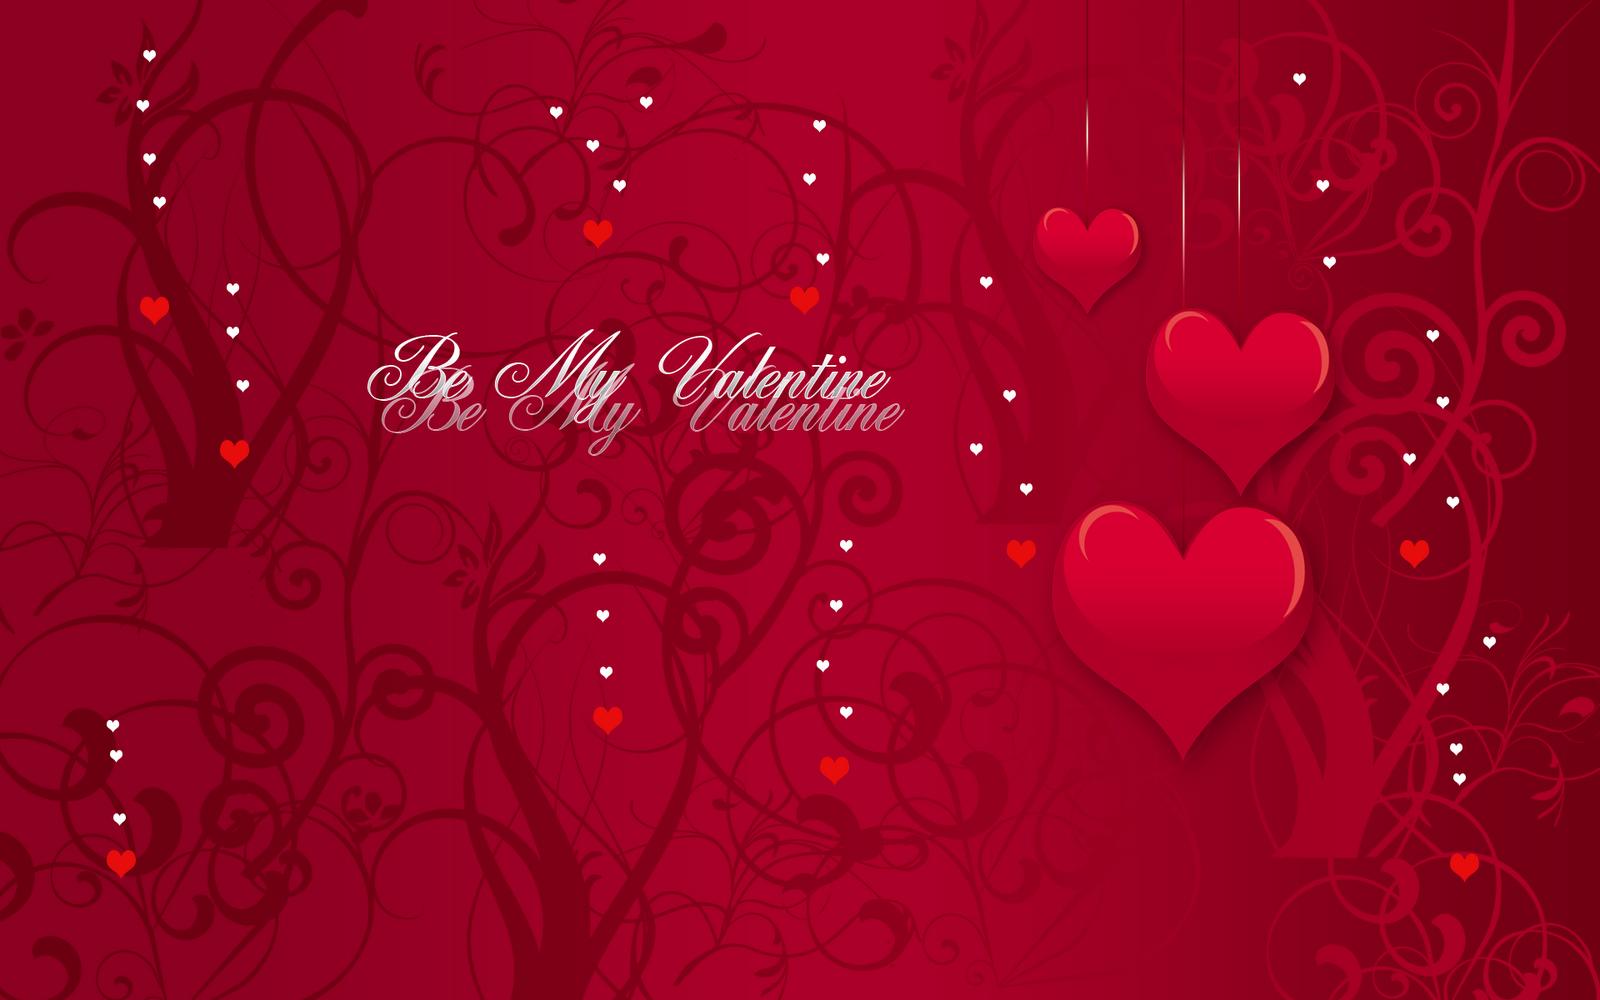 Valentines Day Wallpaper 1600x1000